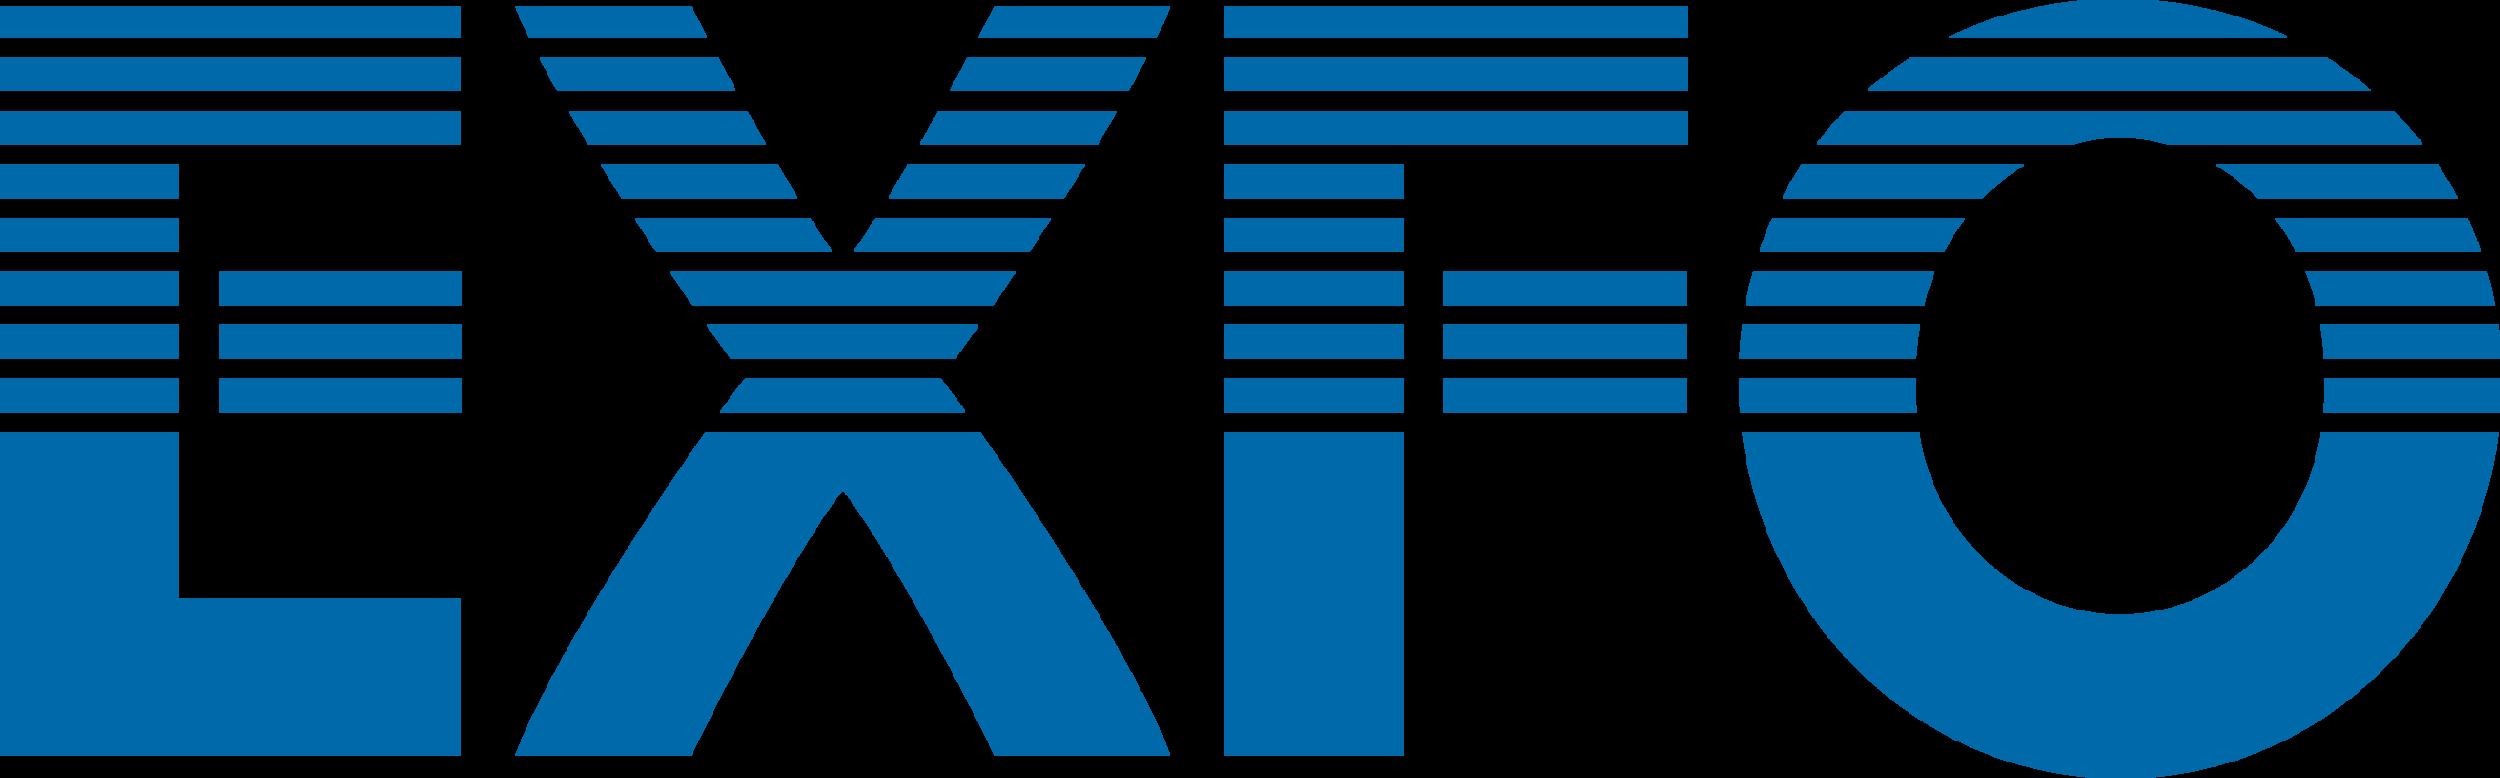 EXFO logo.png